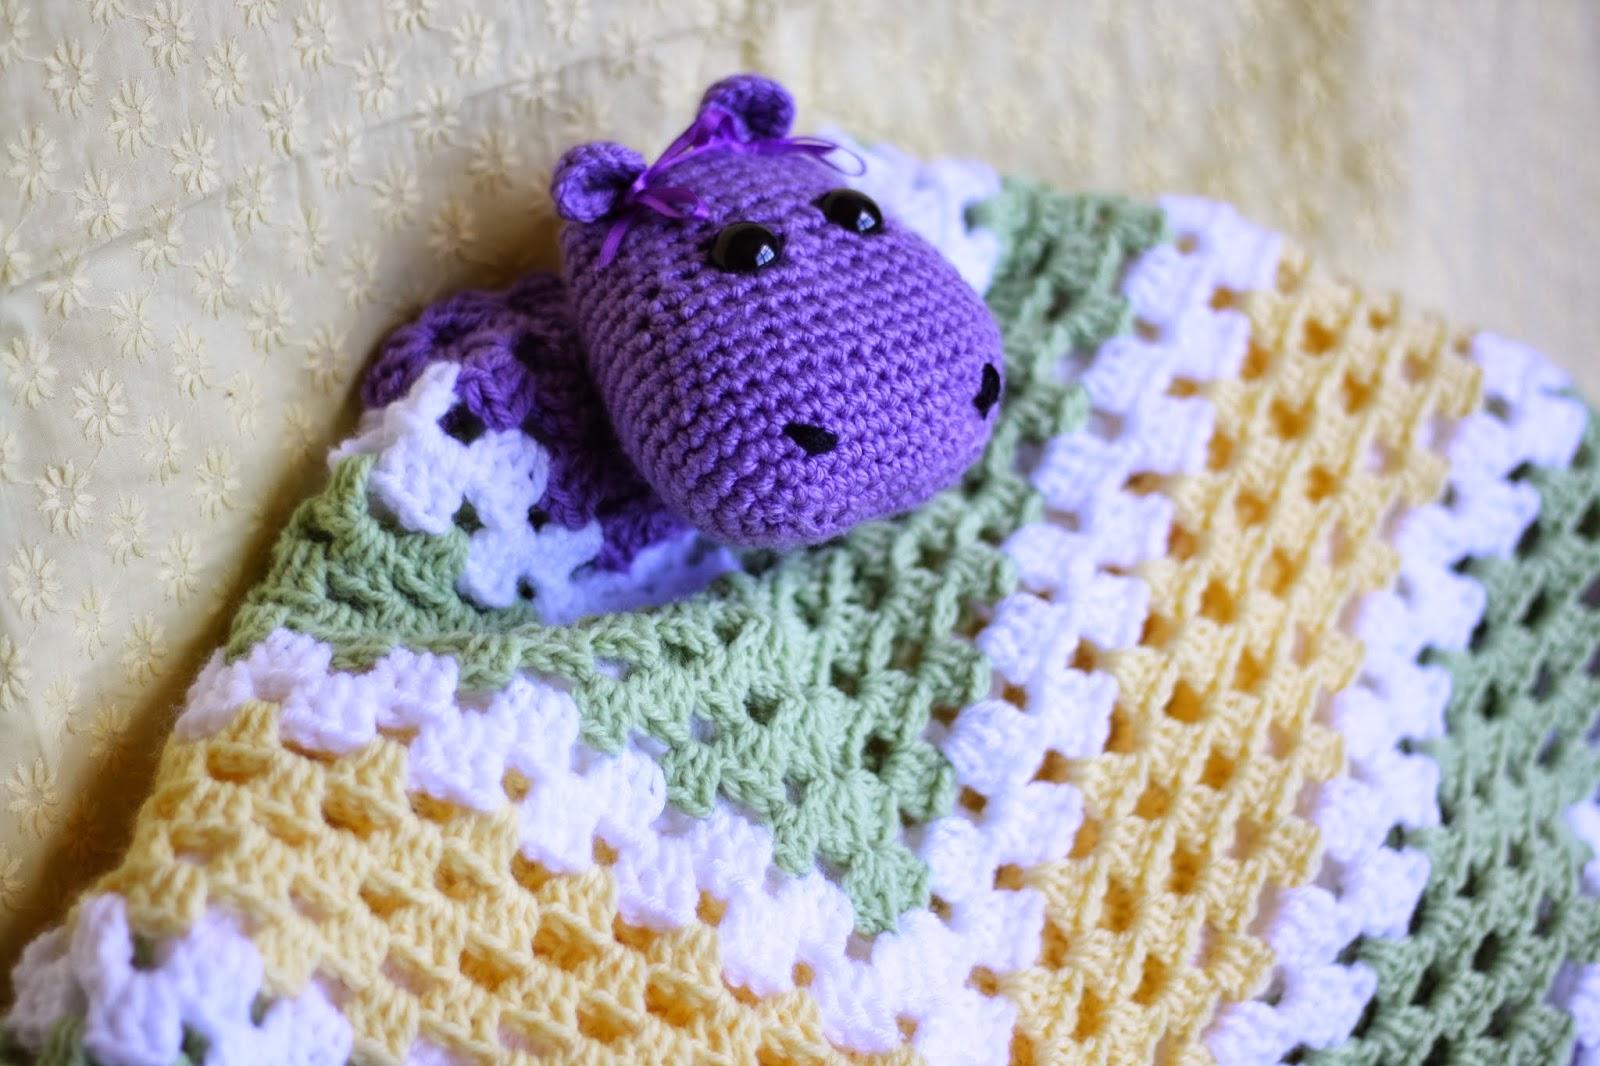 Free Amigurumi Hippo Pattern : Pip the hippo amigurumi lovey security blanket crochet pattern review